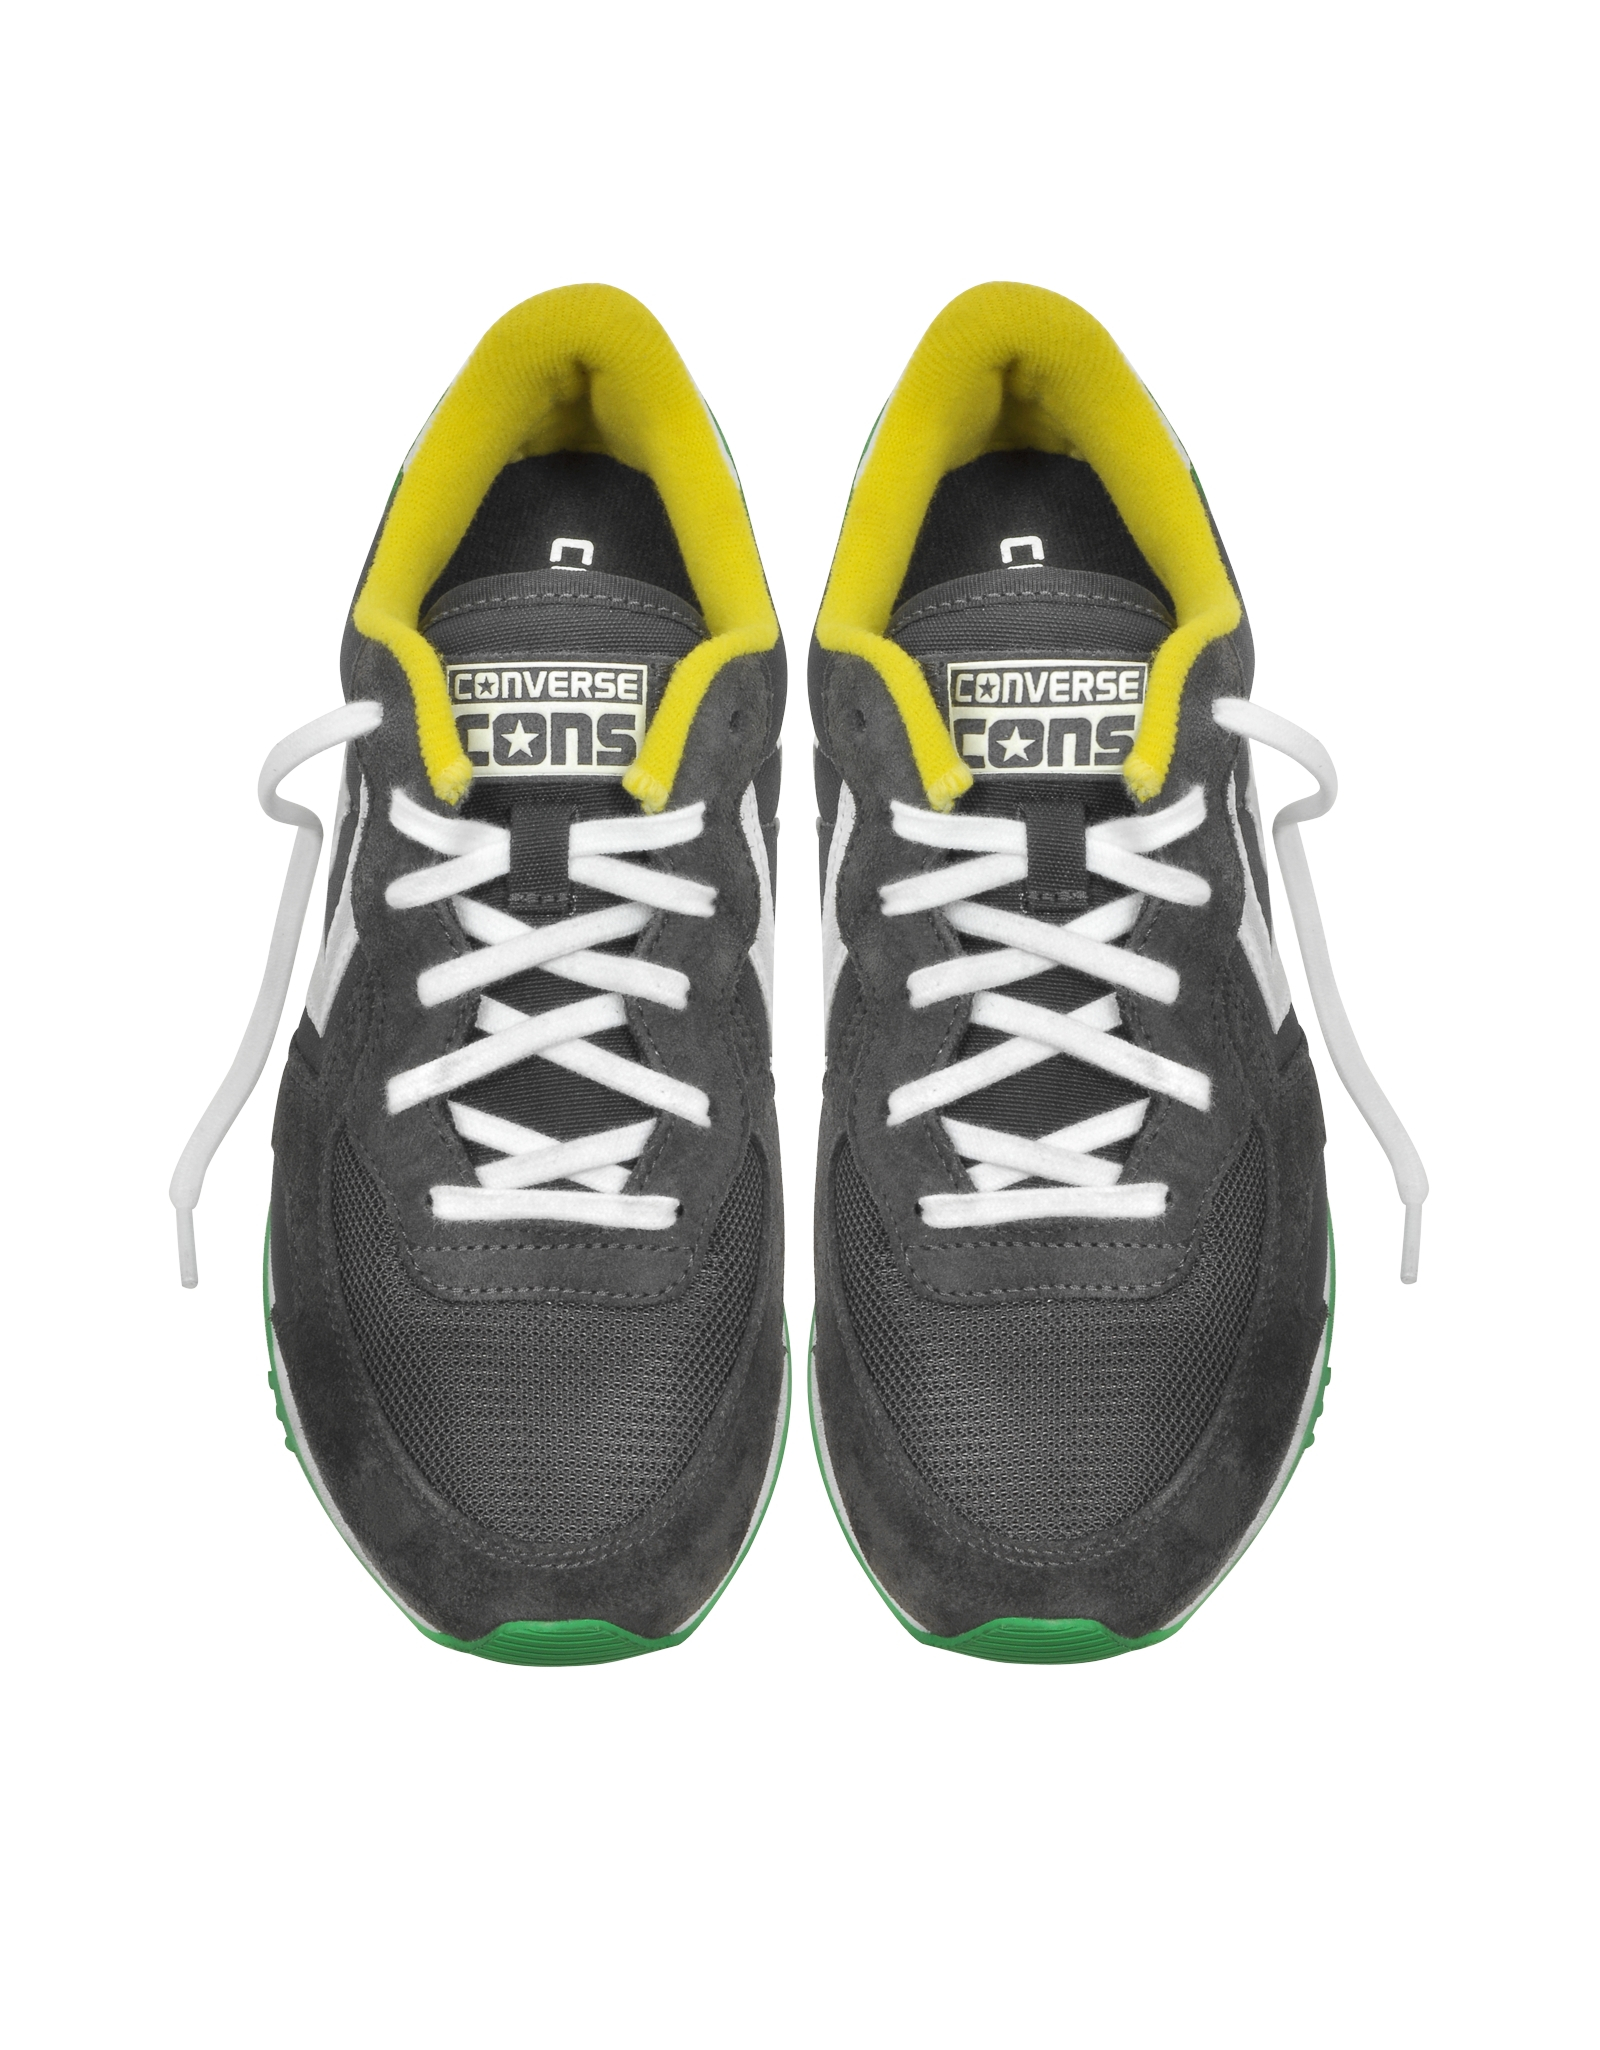 Converse Auckland Racer Ox Iron Emerald Citrus Nylon And